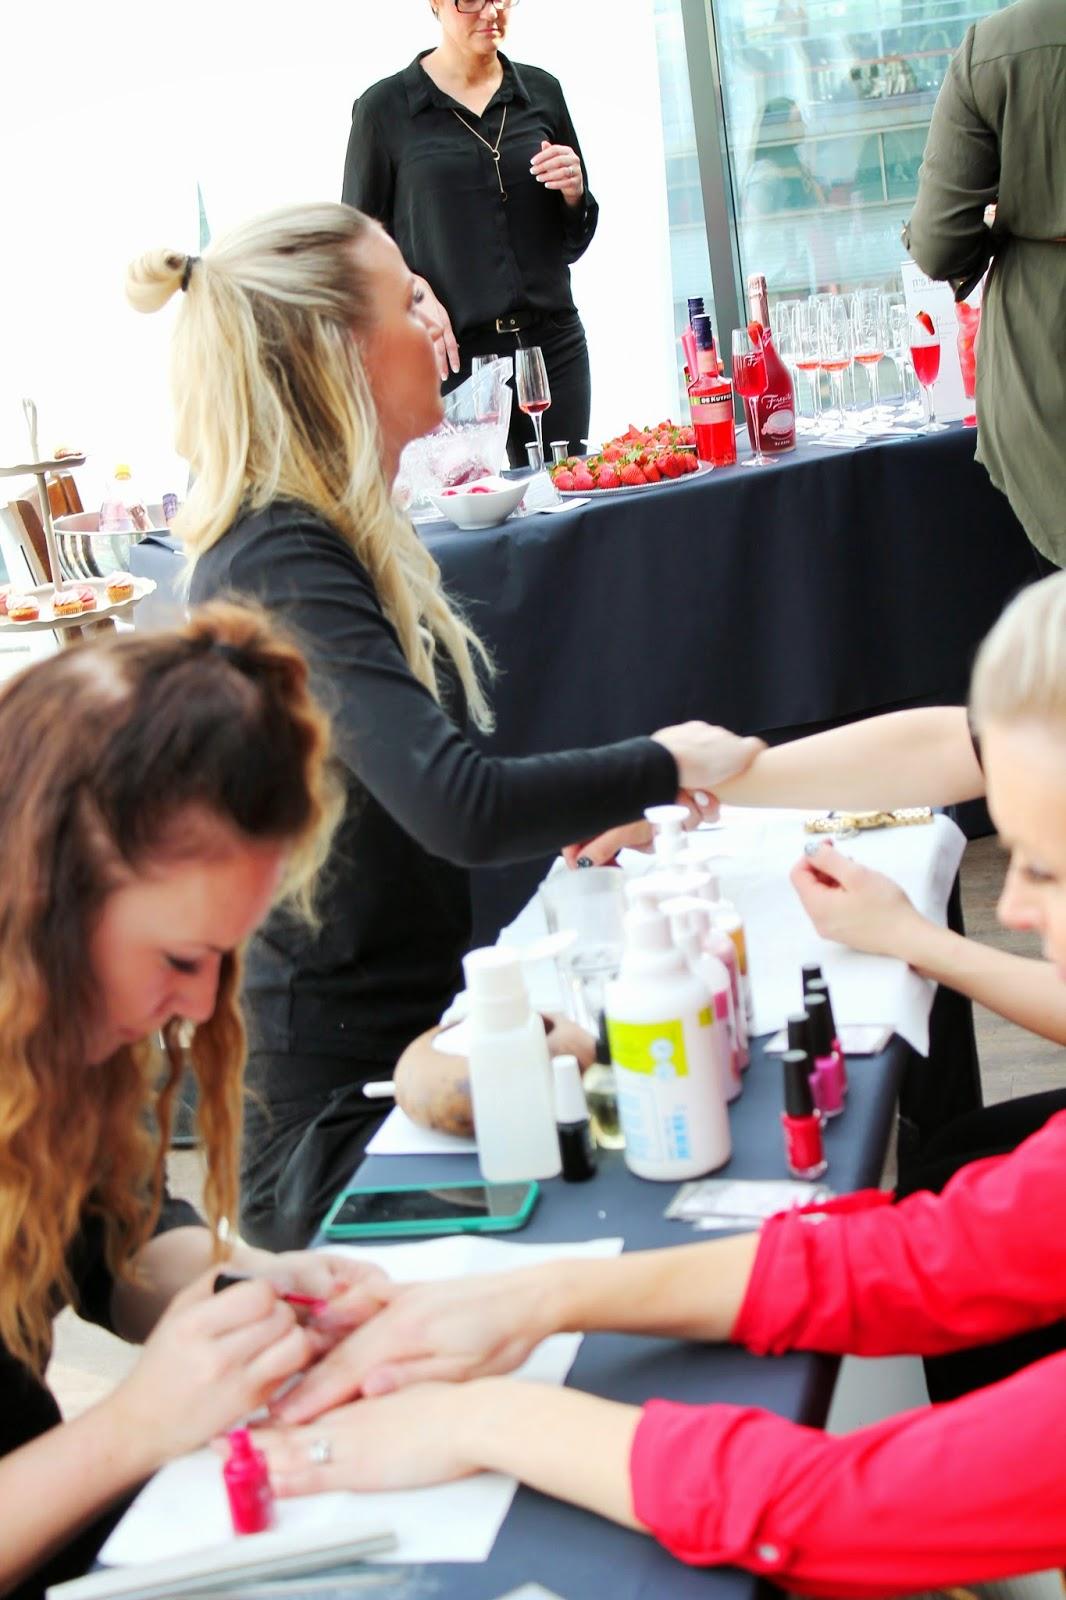 Handcare   Alinan kotona blog #bloggresinspirationday2015 #handcare #manicure #massage